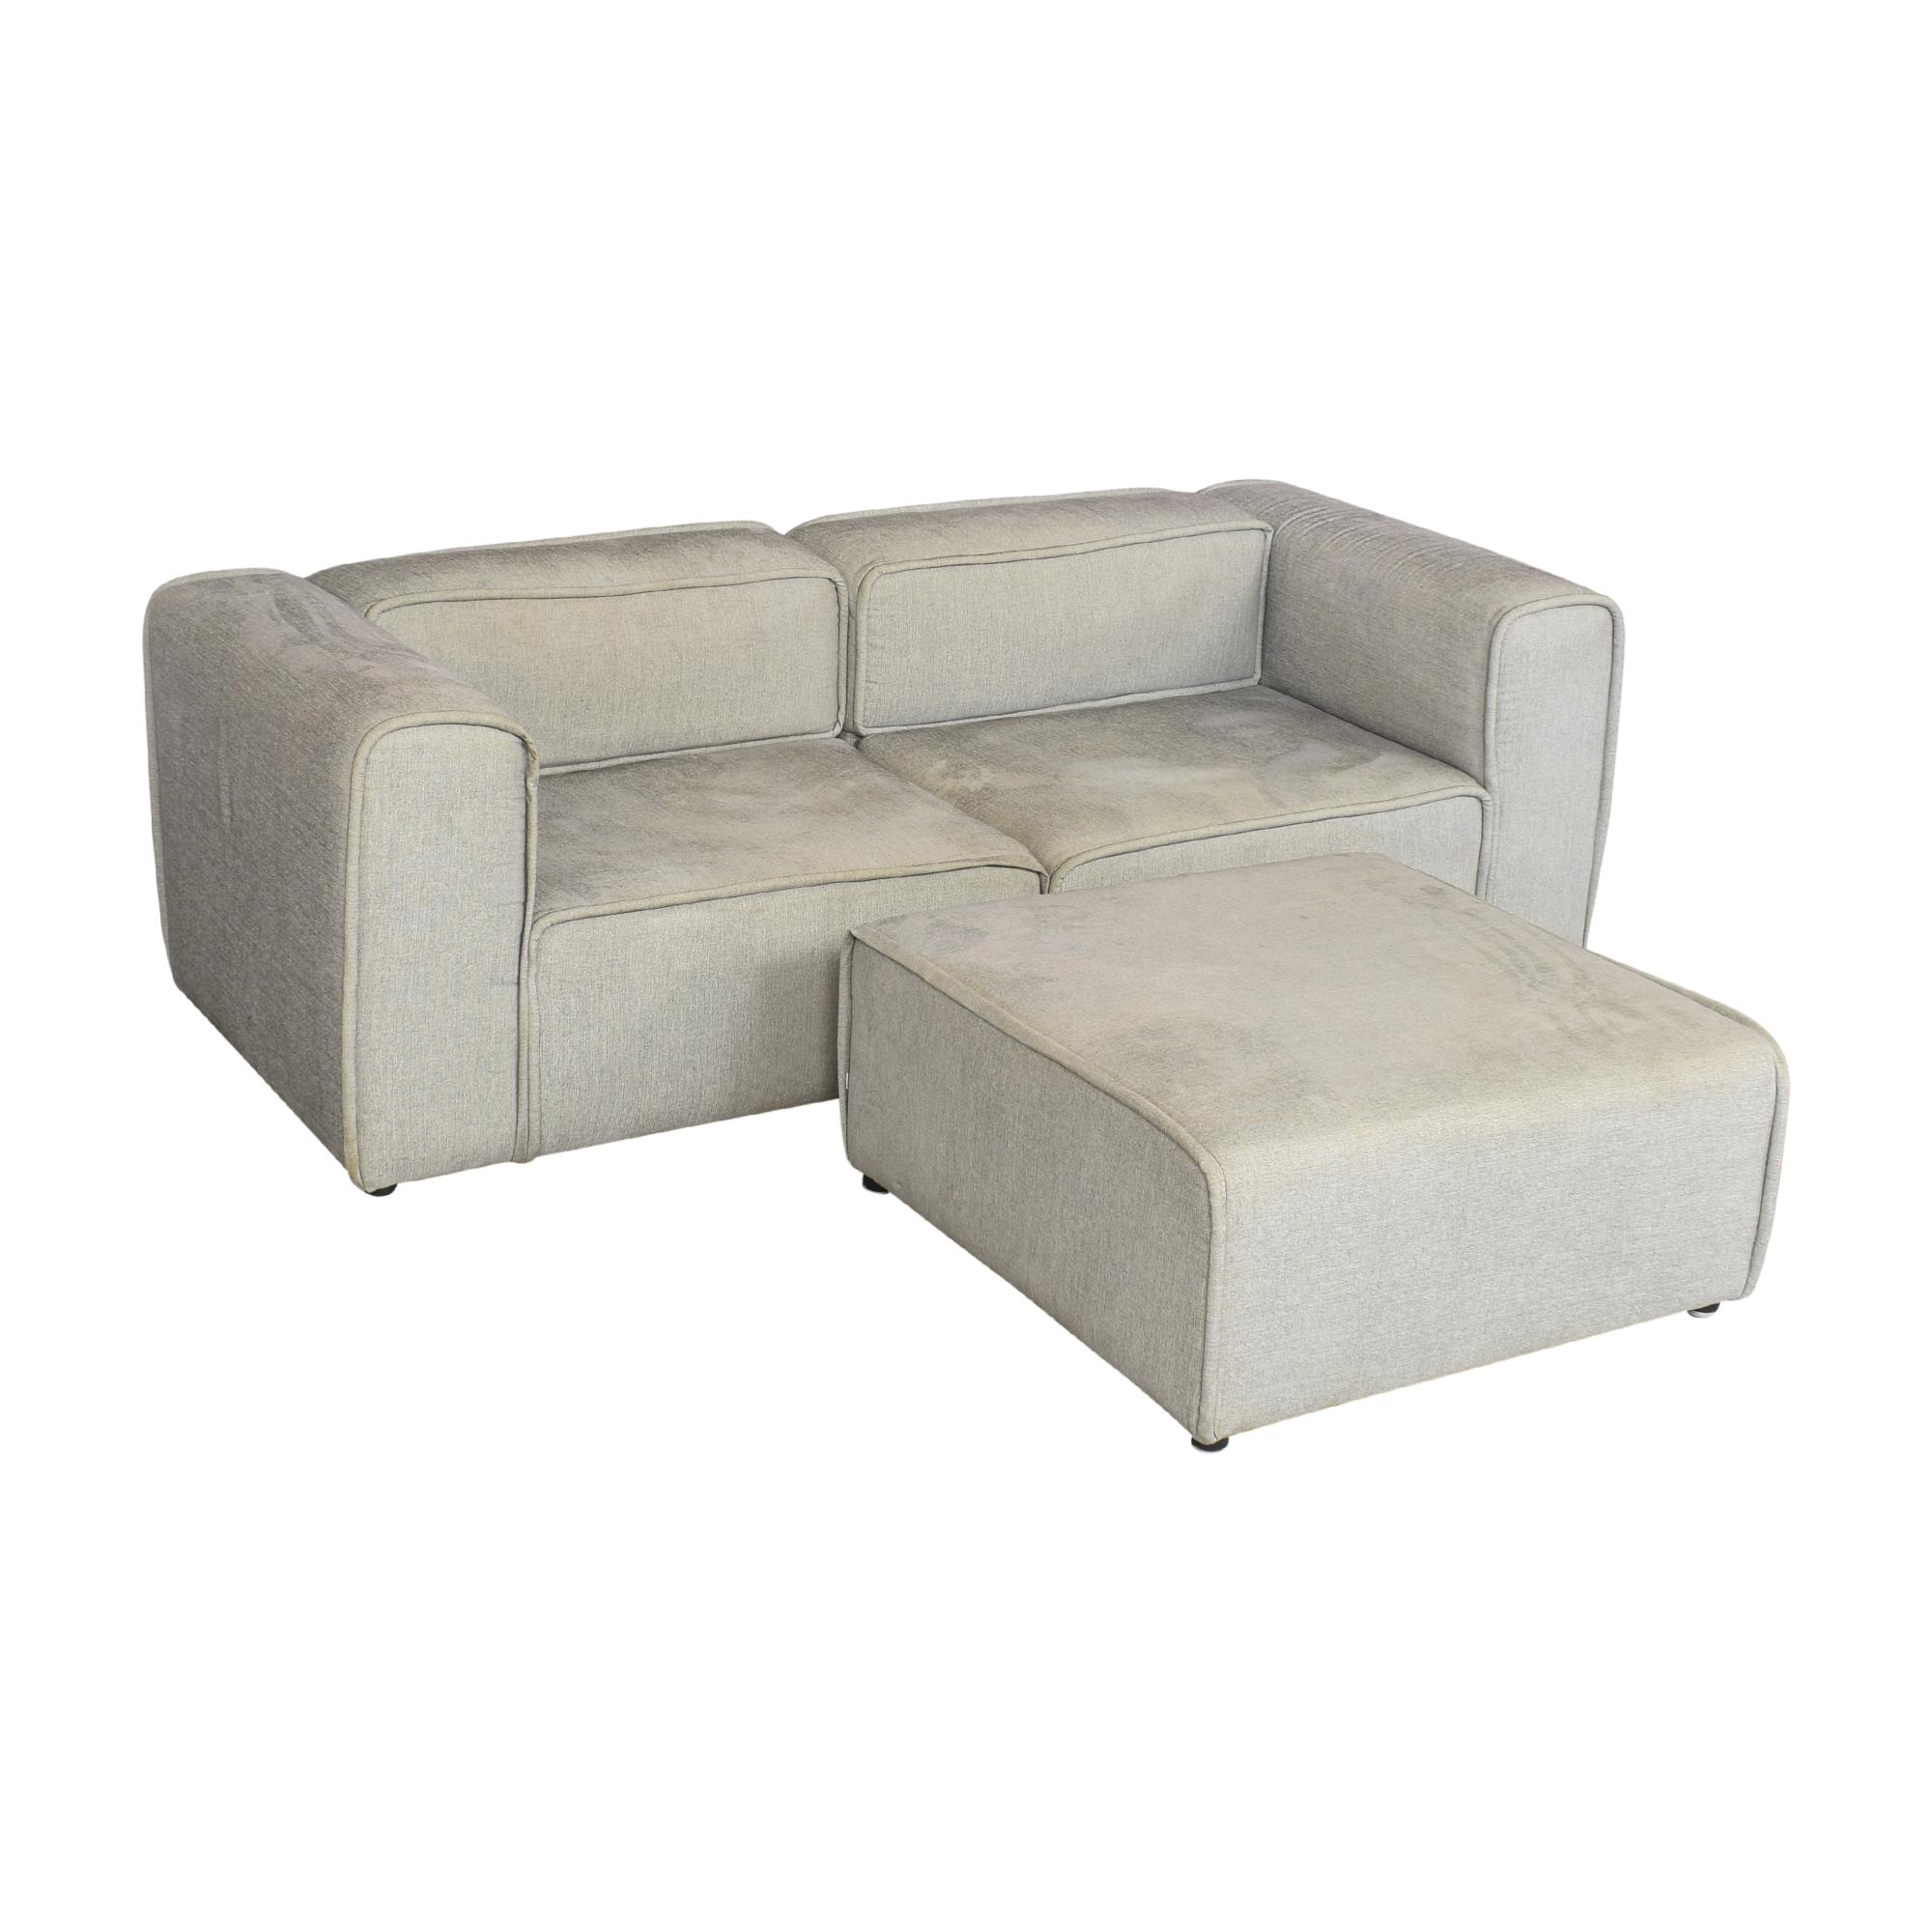 BoConcept BoConcept Carmo Modular Sofa and Ottoman gray